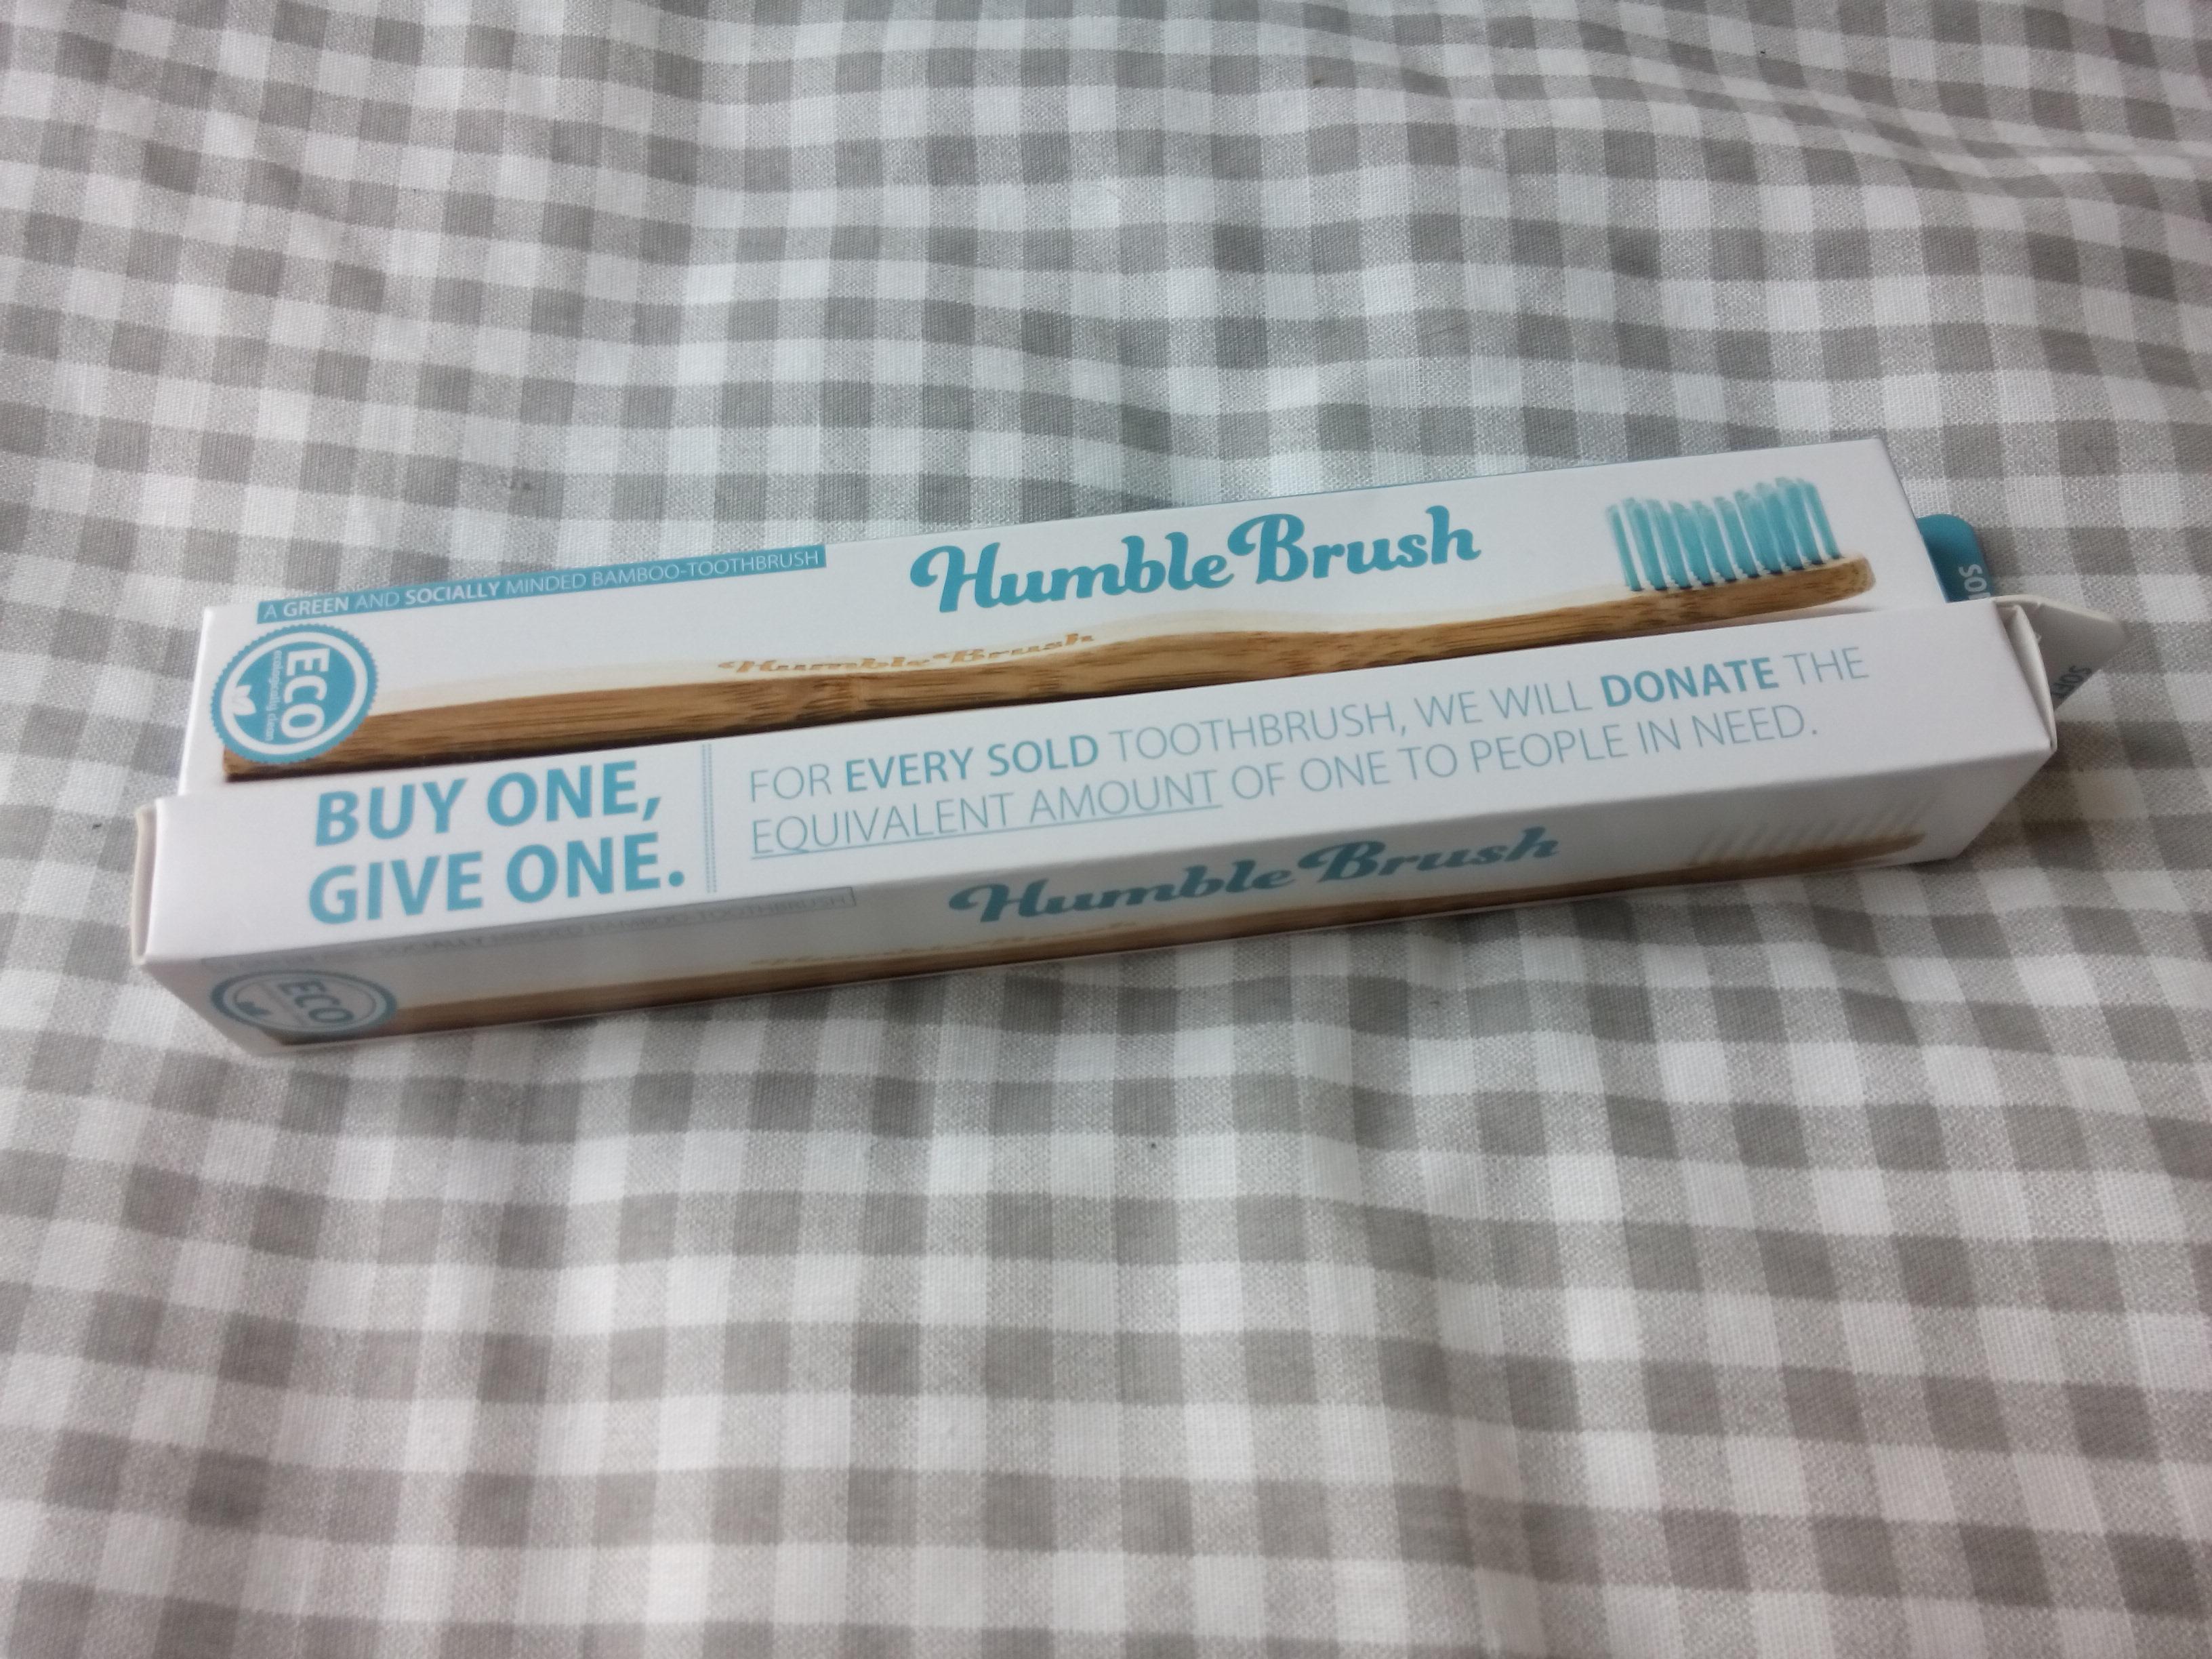 Kudzu tandenborstel